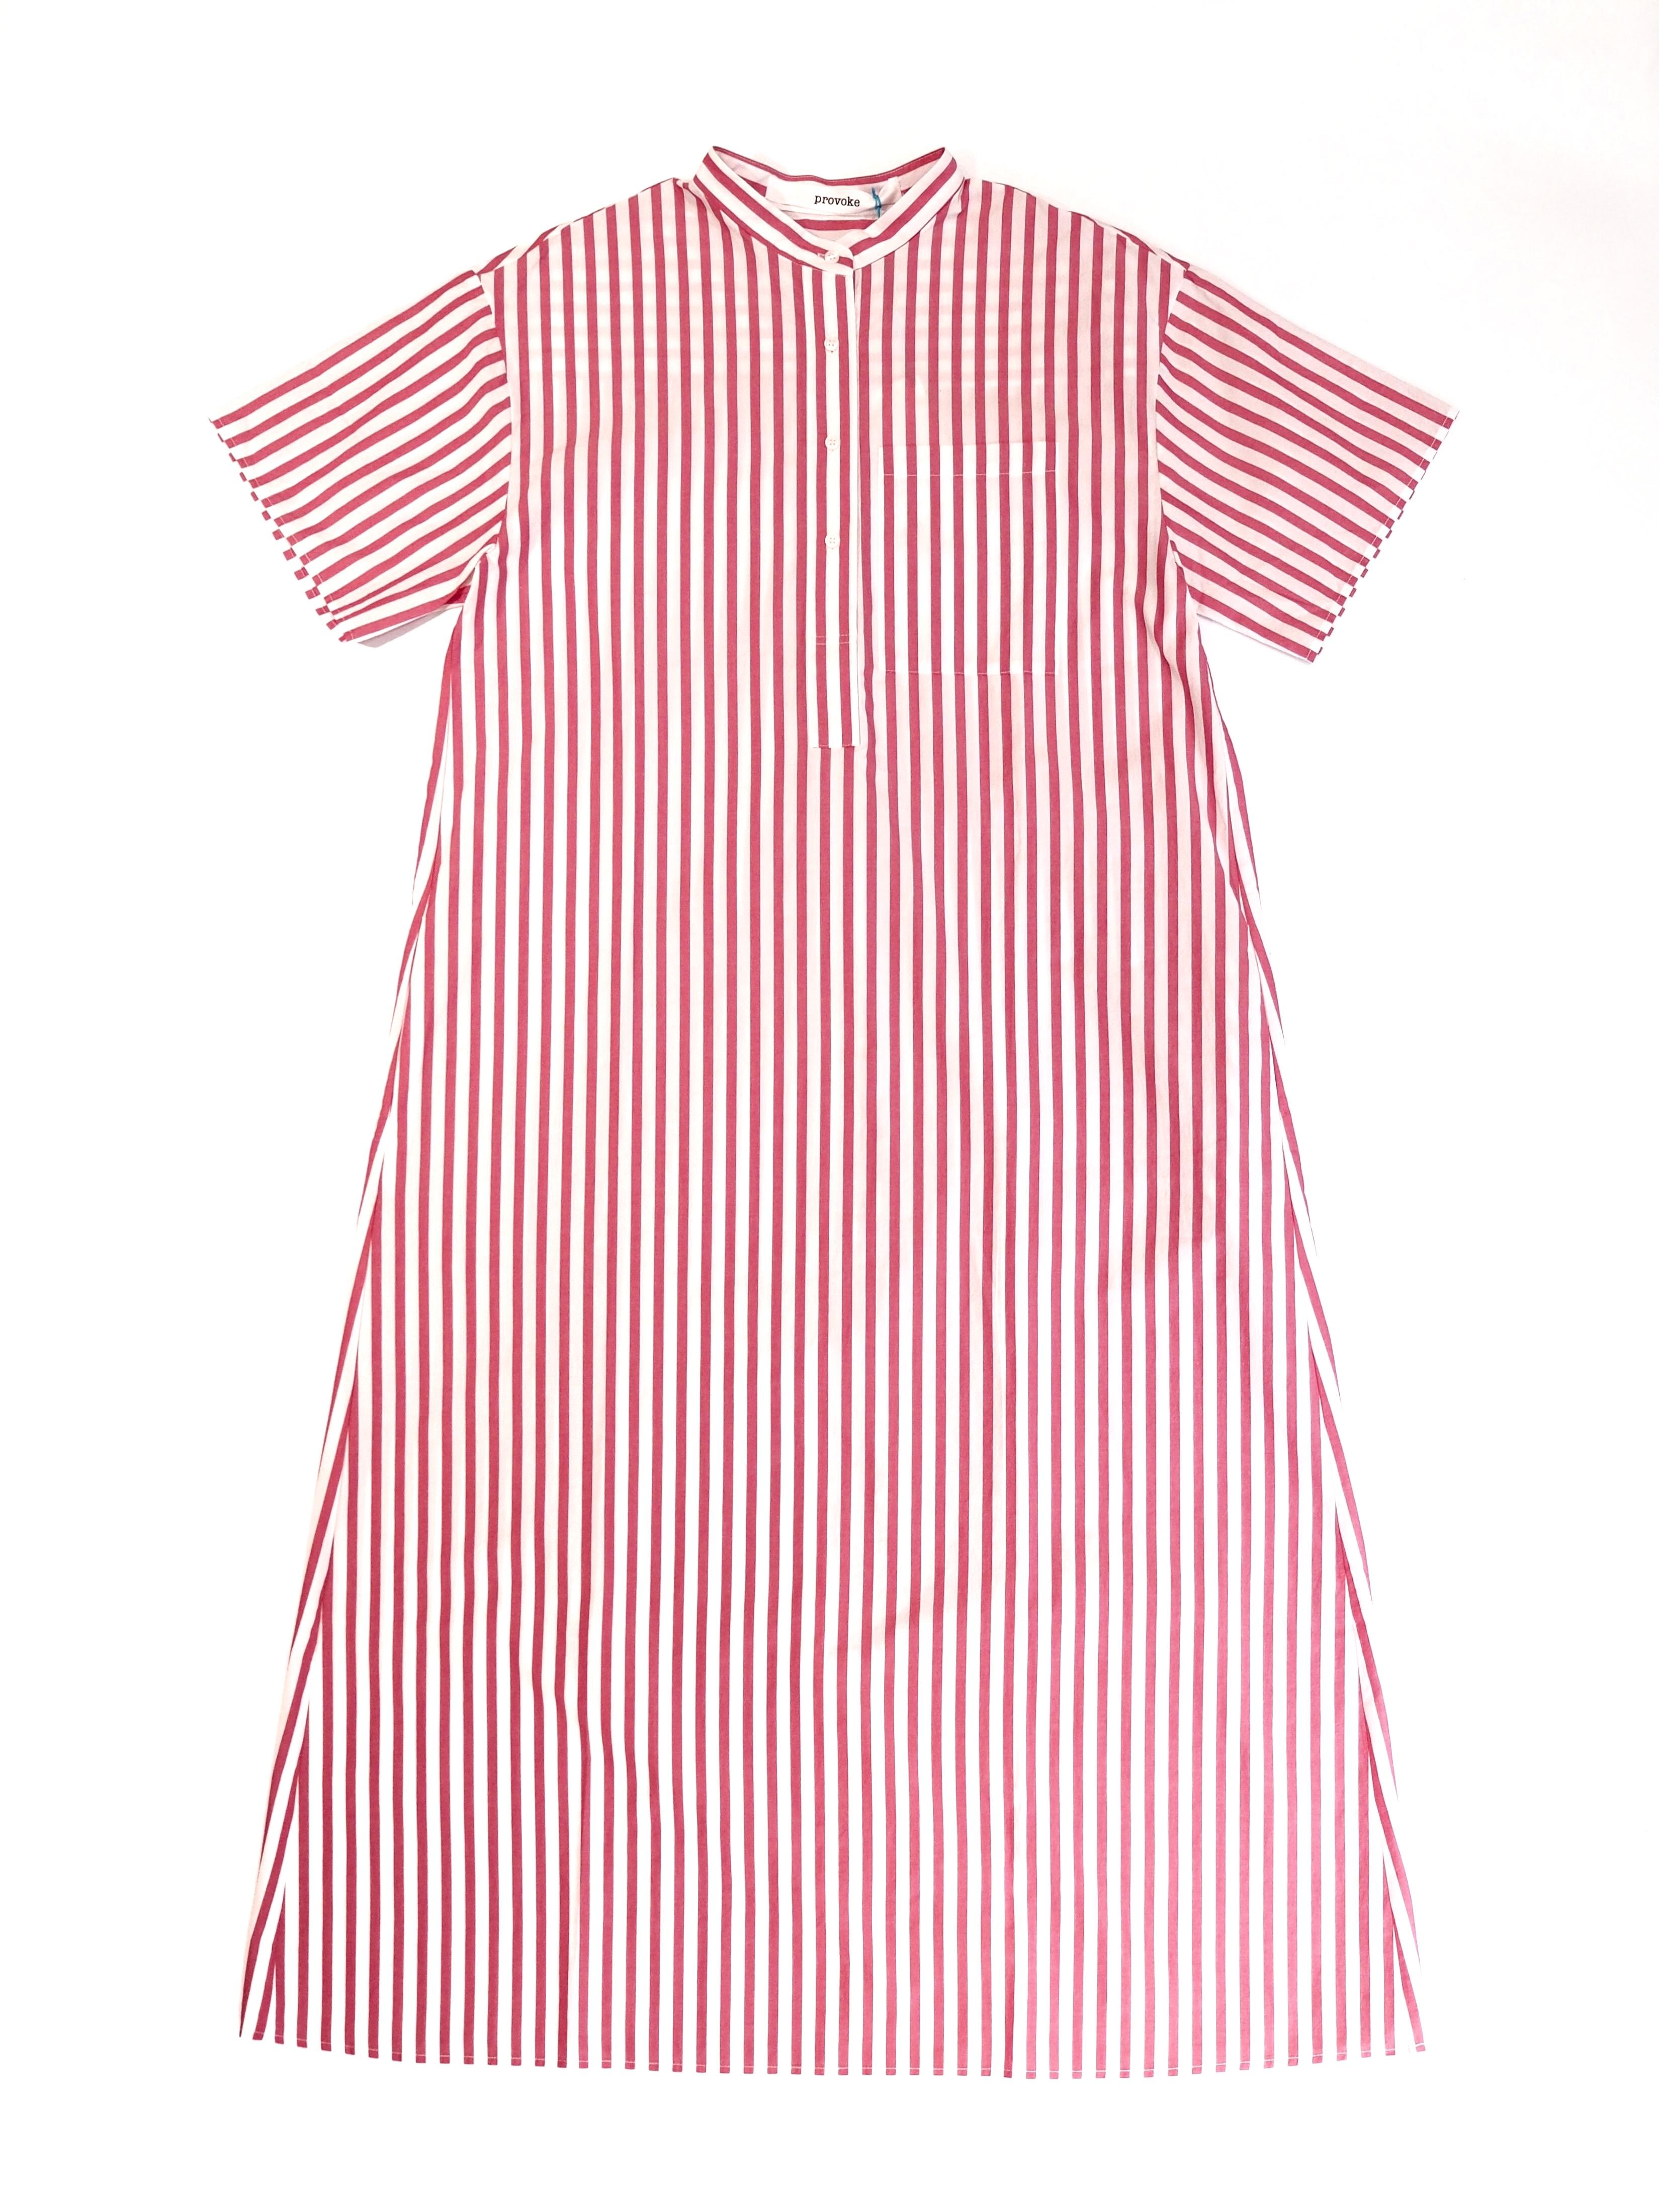 【PROVOKE】STRIPE SUPER LONG  SHIRT-DRESS